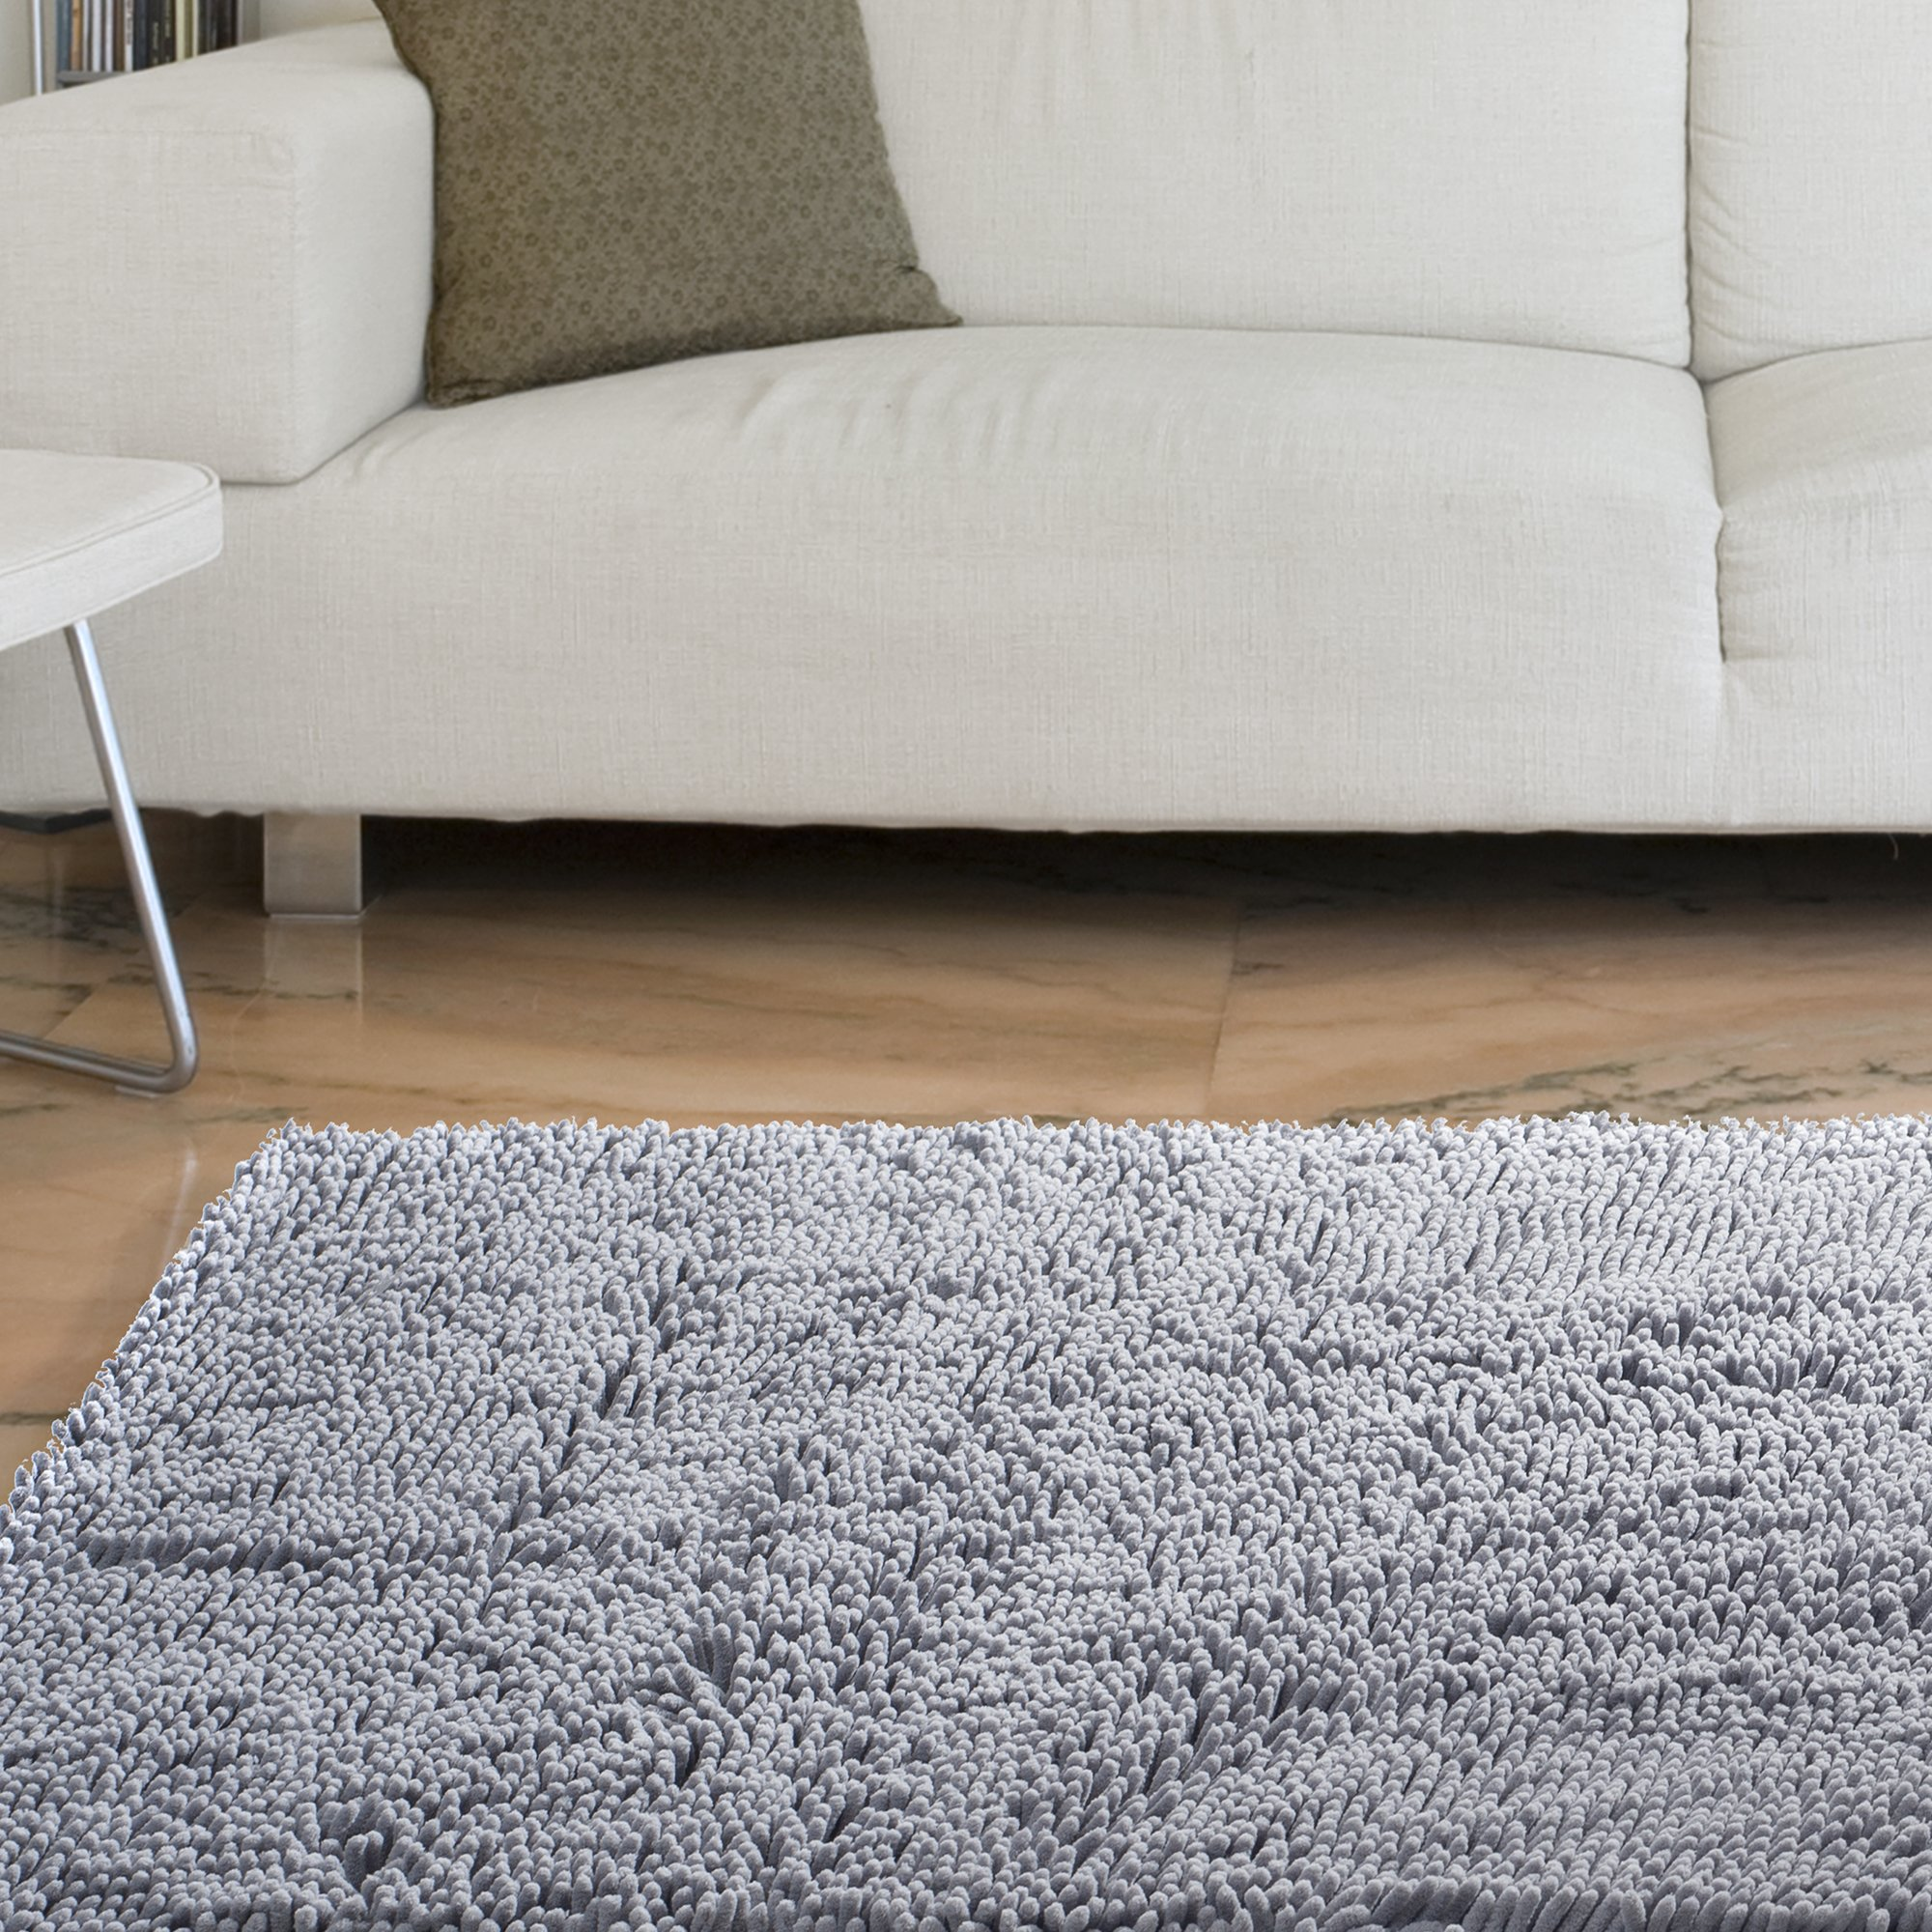 Bedford Home High Pile Shag Rug Carpet, 21 x 36, Grey